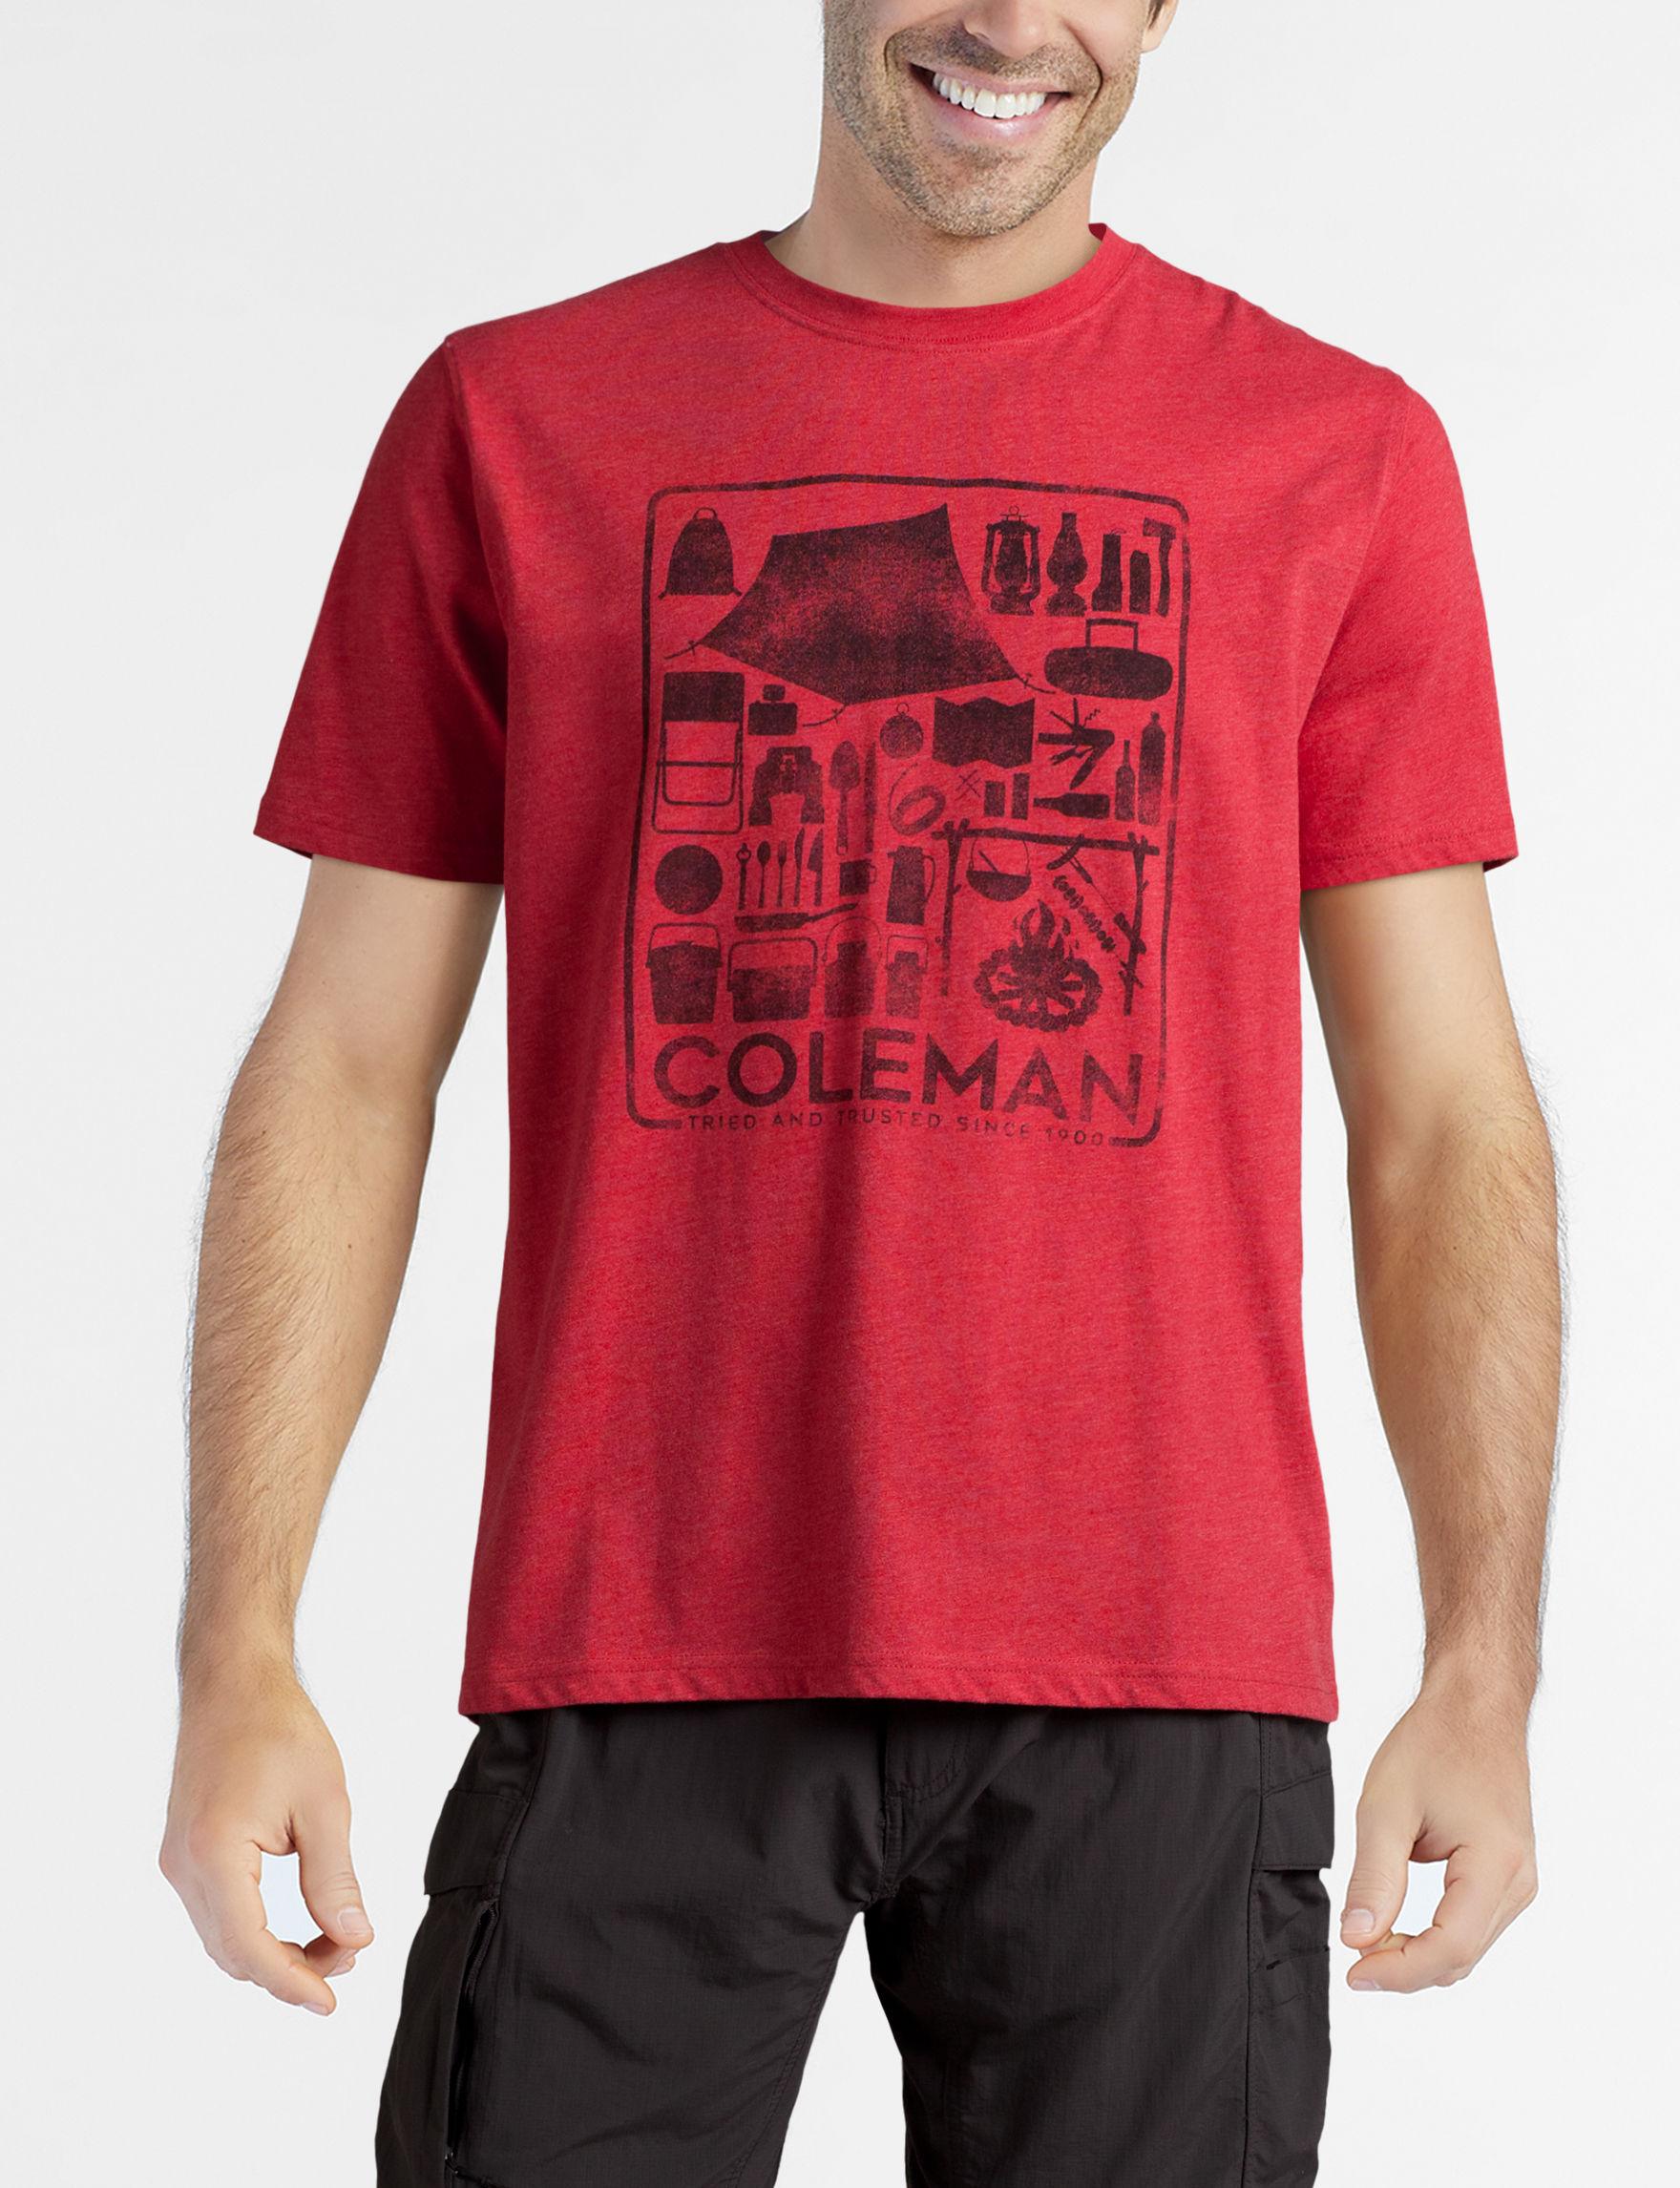 Coleman Red Tees & Tanks